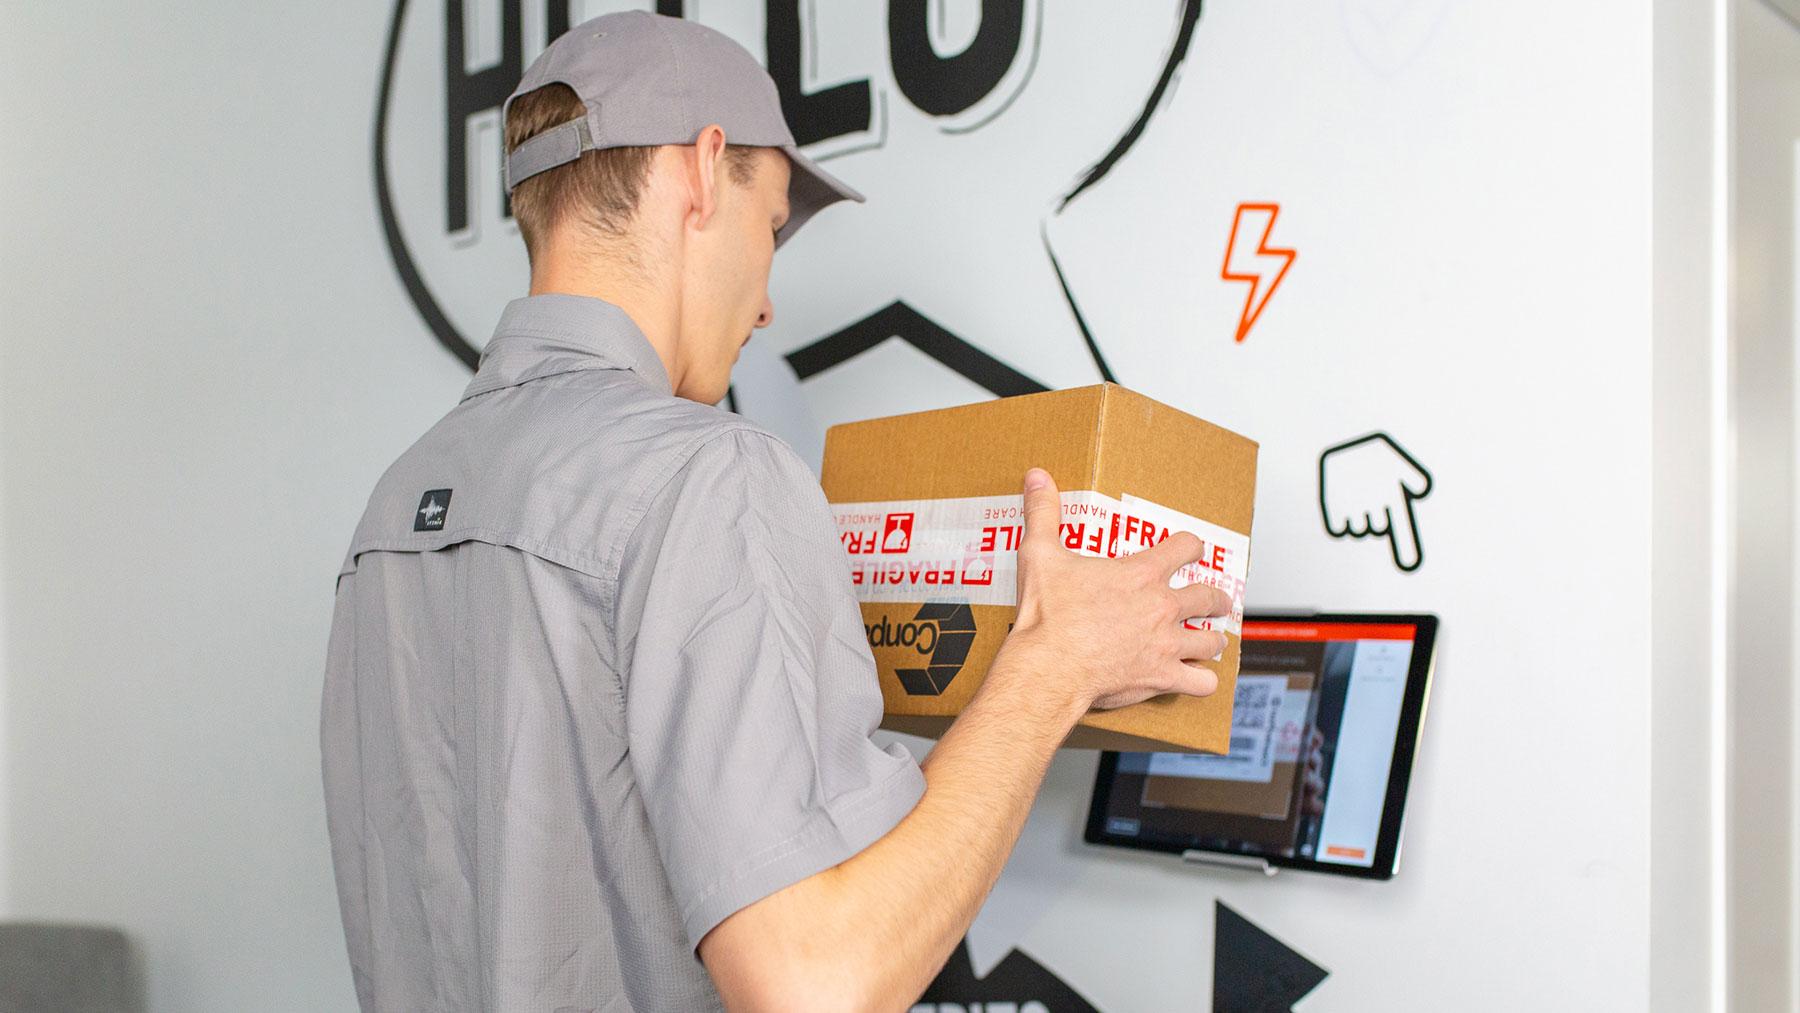 #6 Deliveries Video